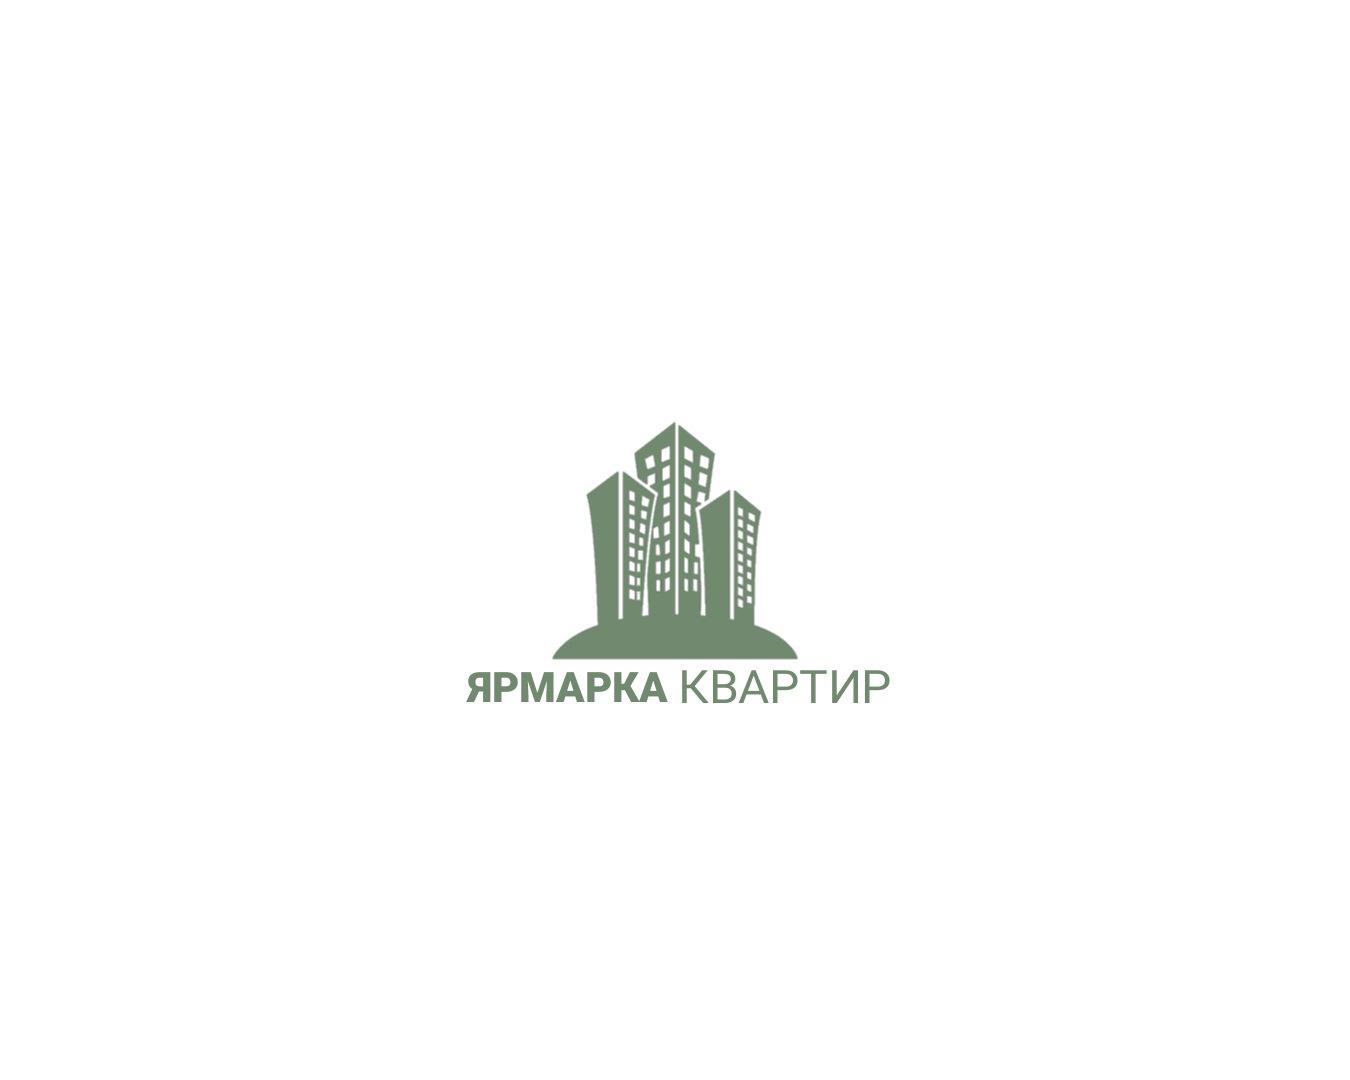 Создание логотипа, с вариантами для визитки и листовки фото f_1366004289fbafe7.jpg